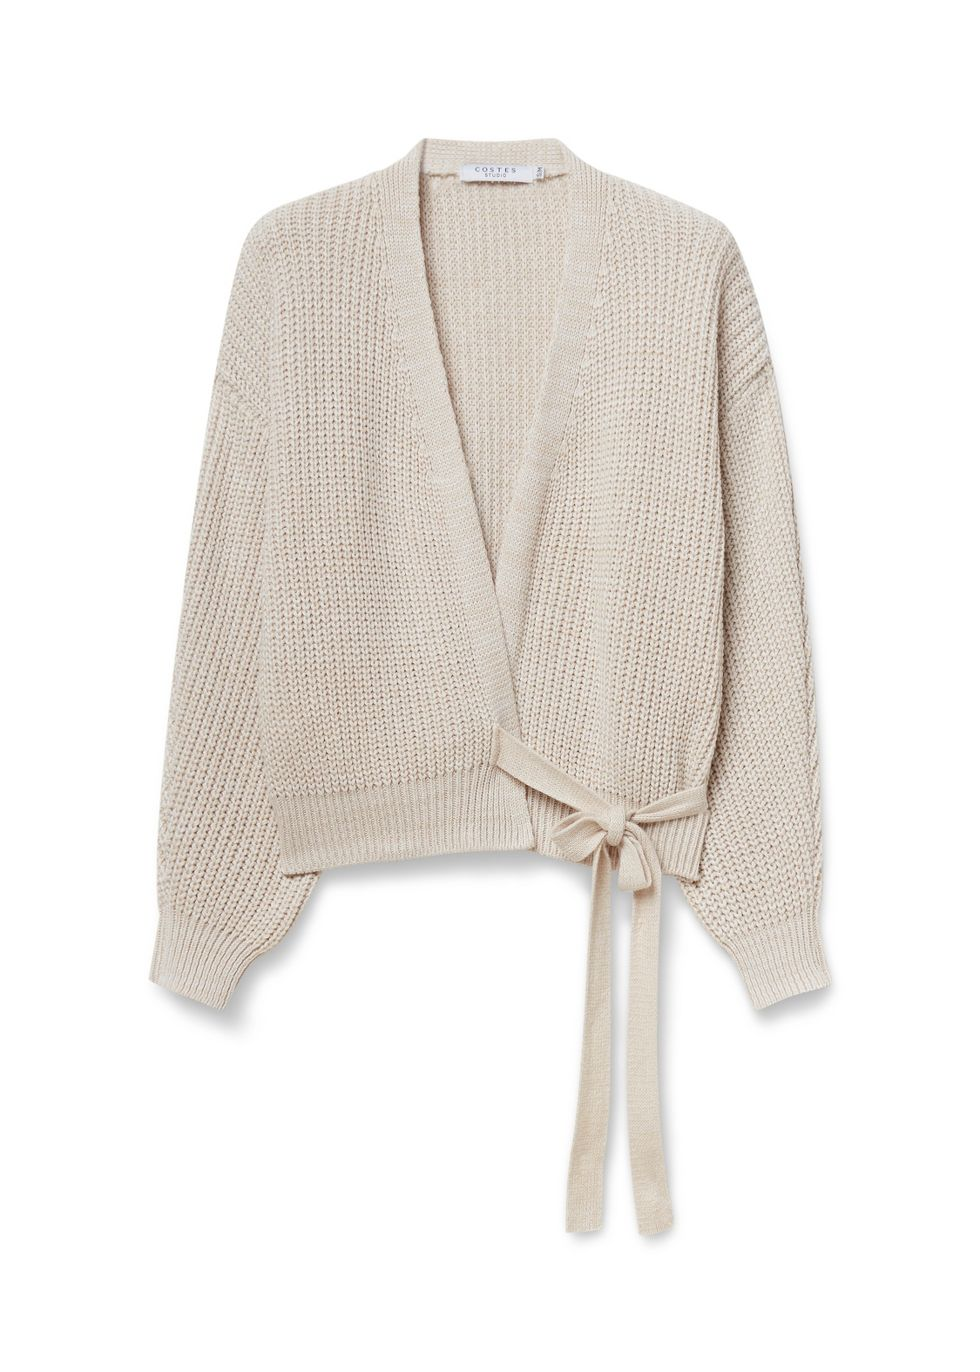 Truien & Vesten voor dames   Shop online   Costes Fashion